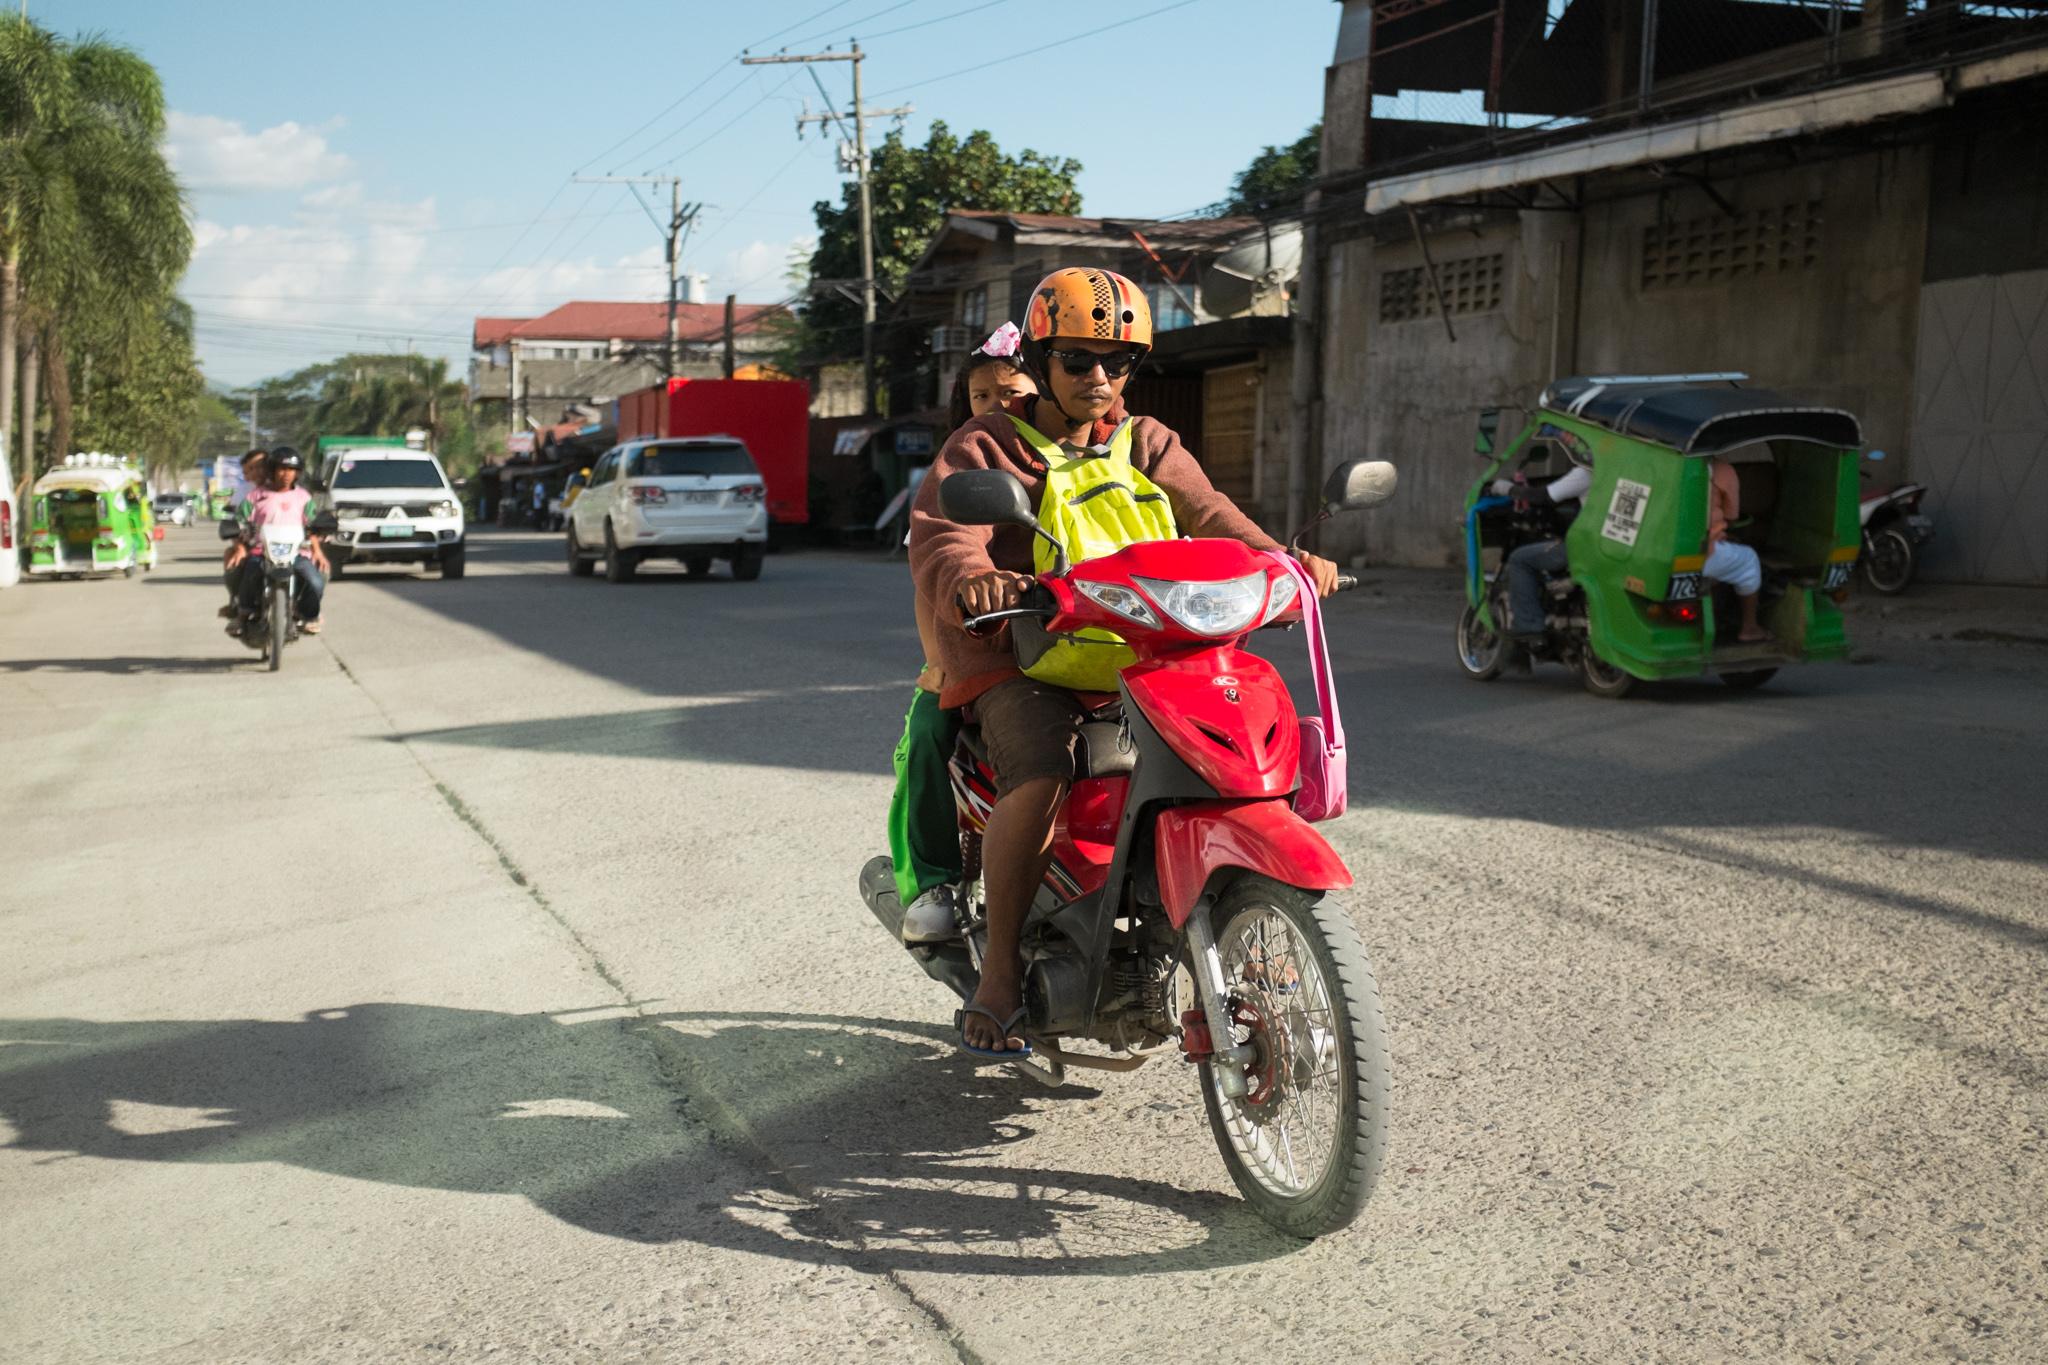 3090-philippines_scooter-biking.jpg